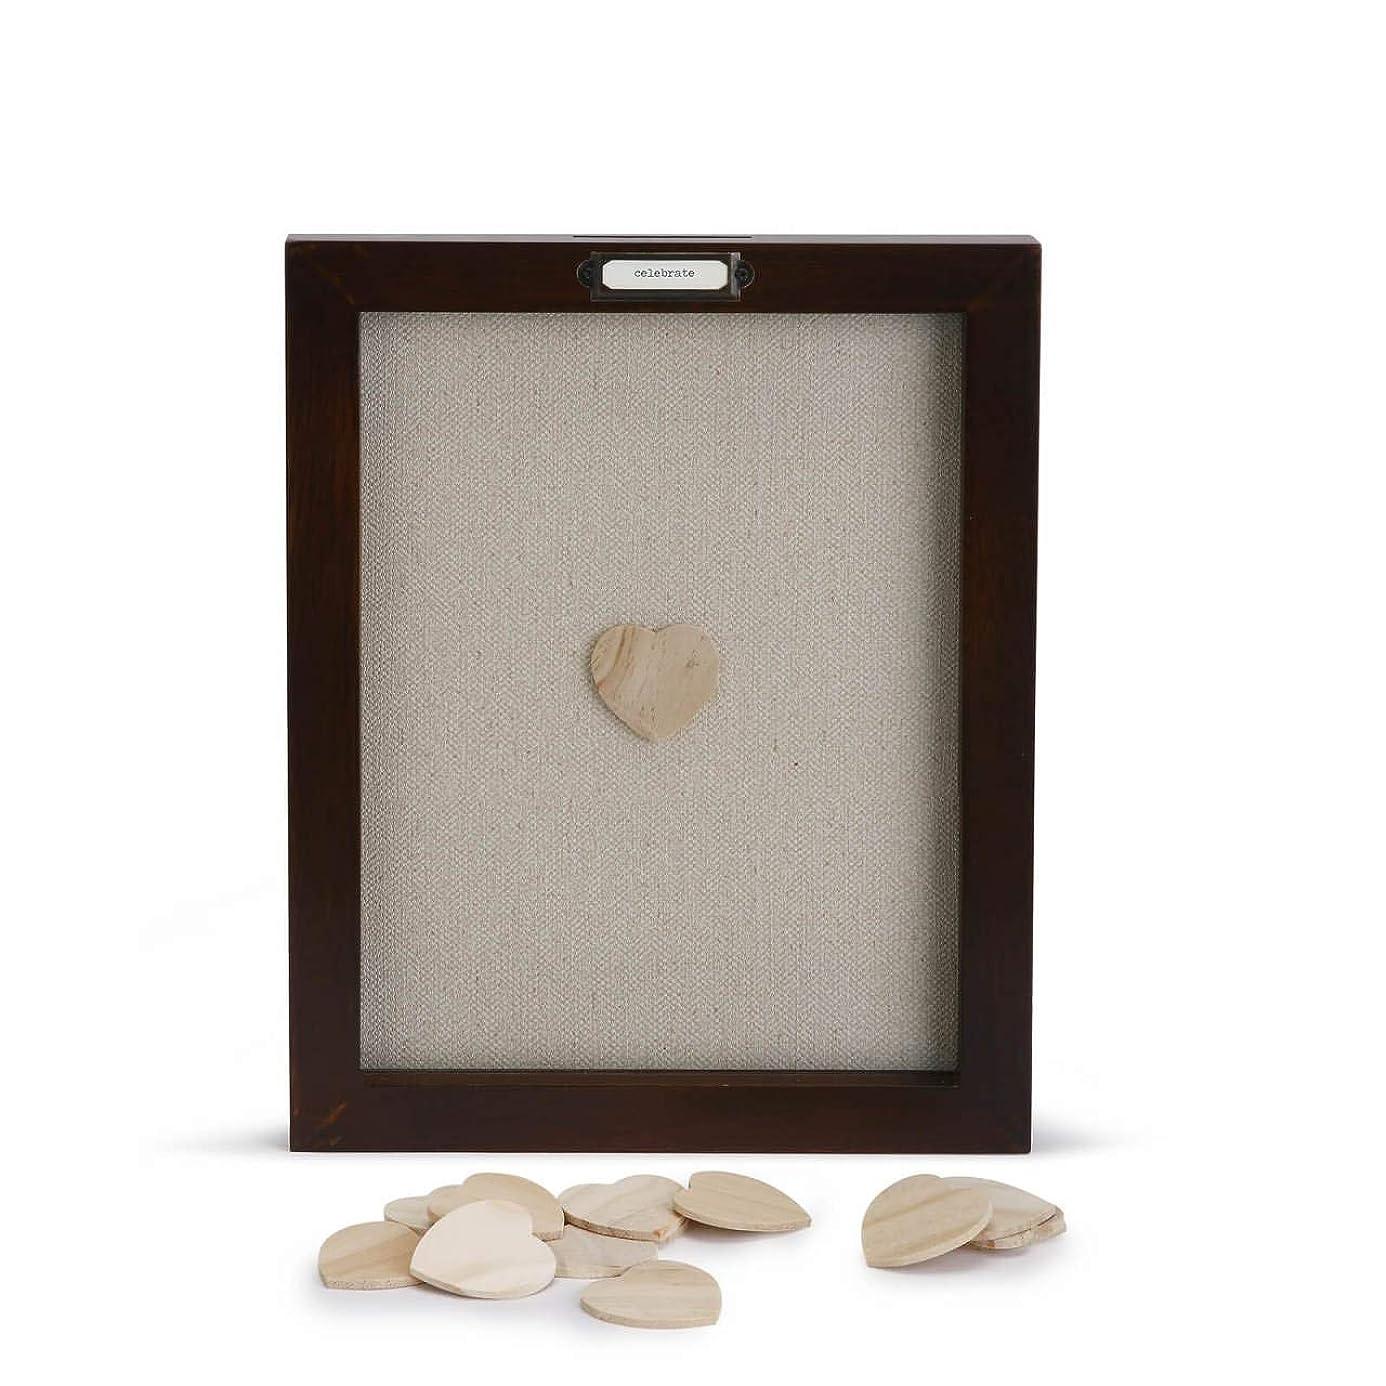 DEMDACO Loving Hearts Guest Book Small 13 x 10 Wood Framed Wall Art Plaque zfp2009632